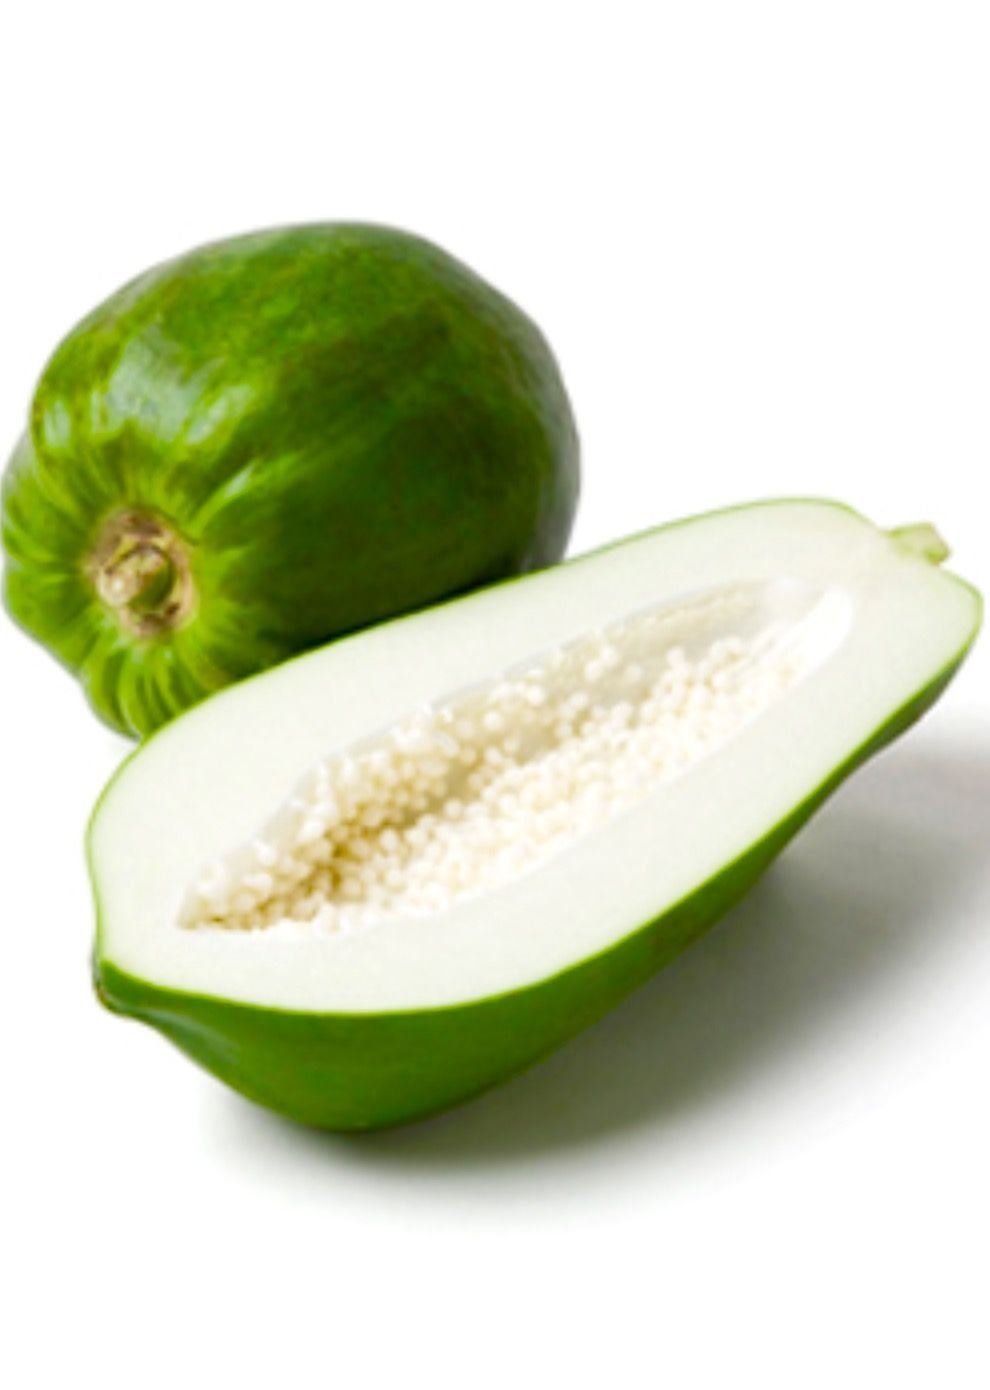 Gutfixx digestive health solutions sliced papaya forumfinder Gallery